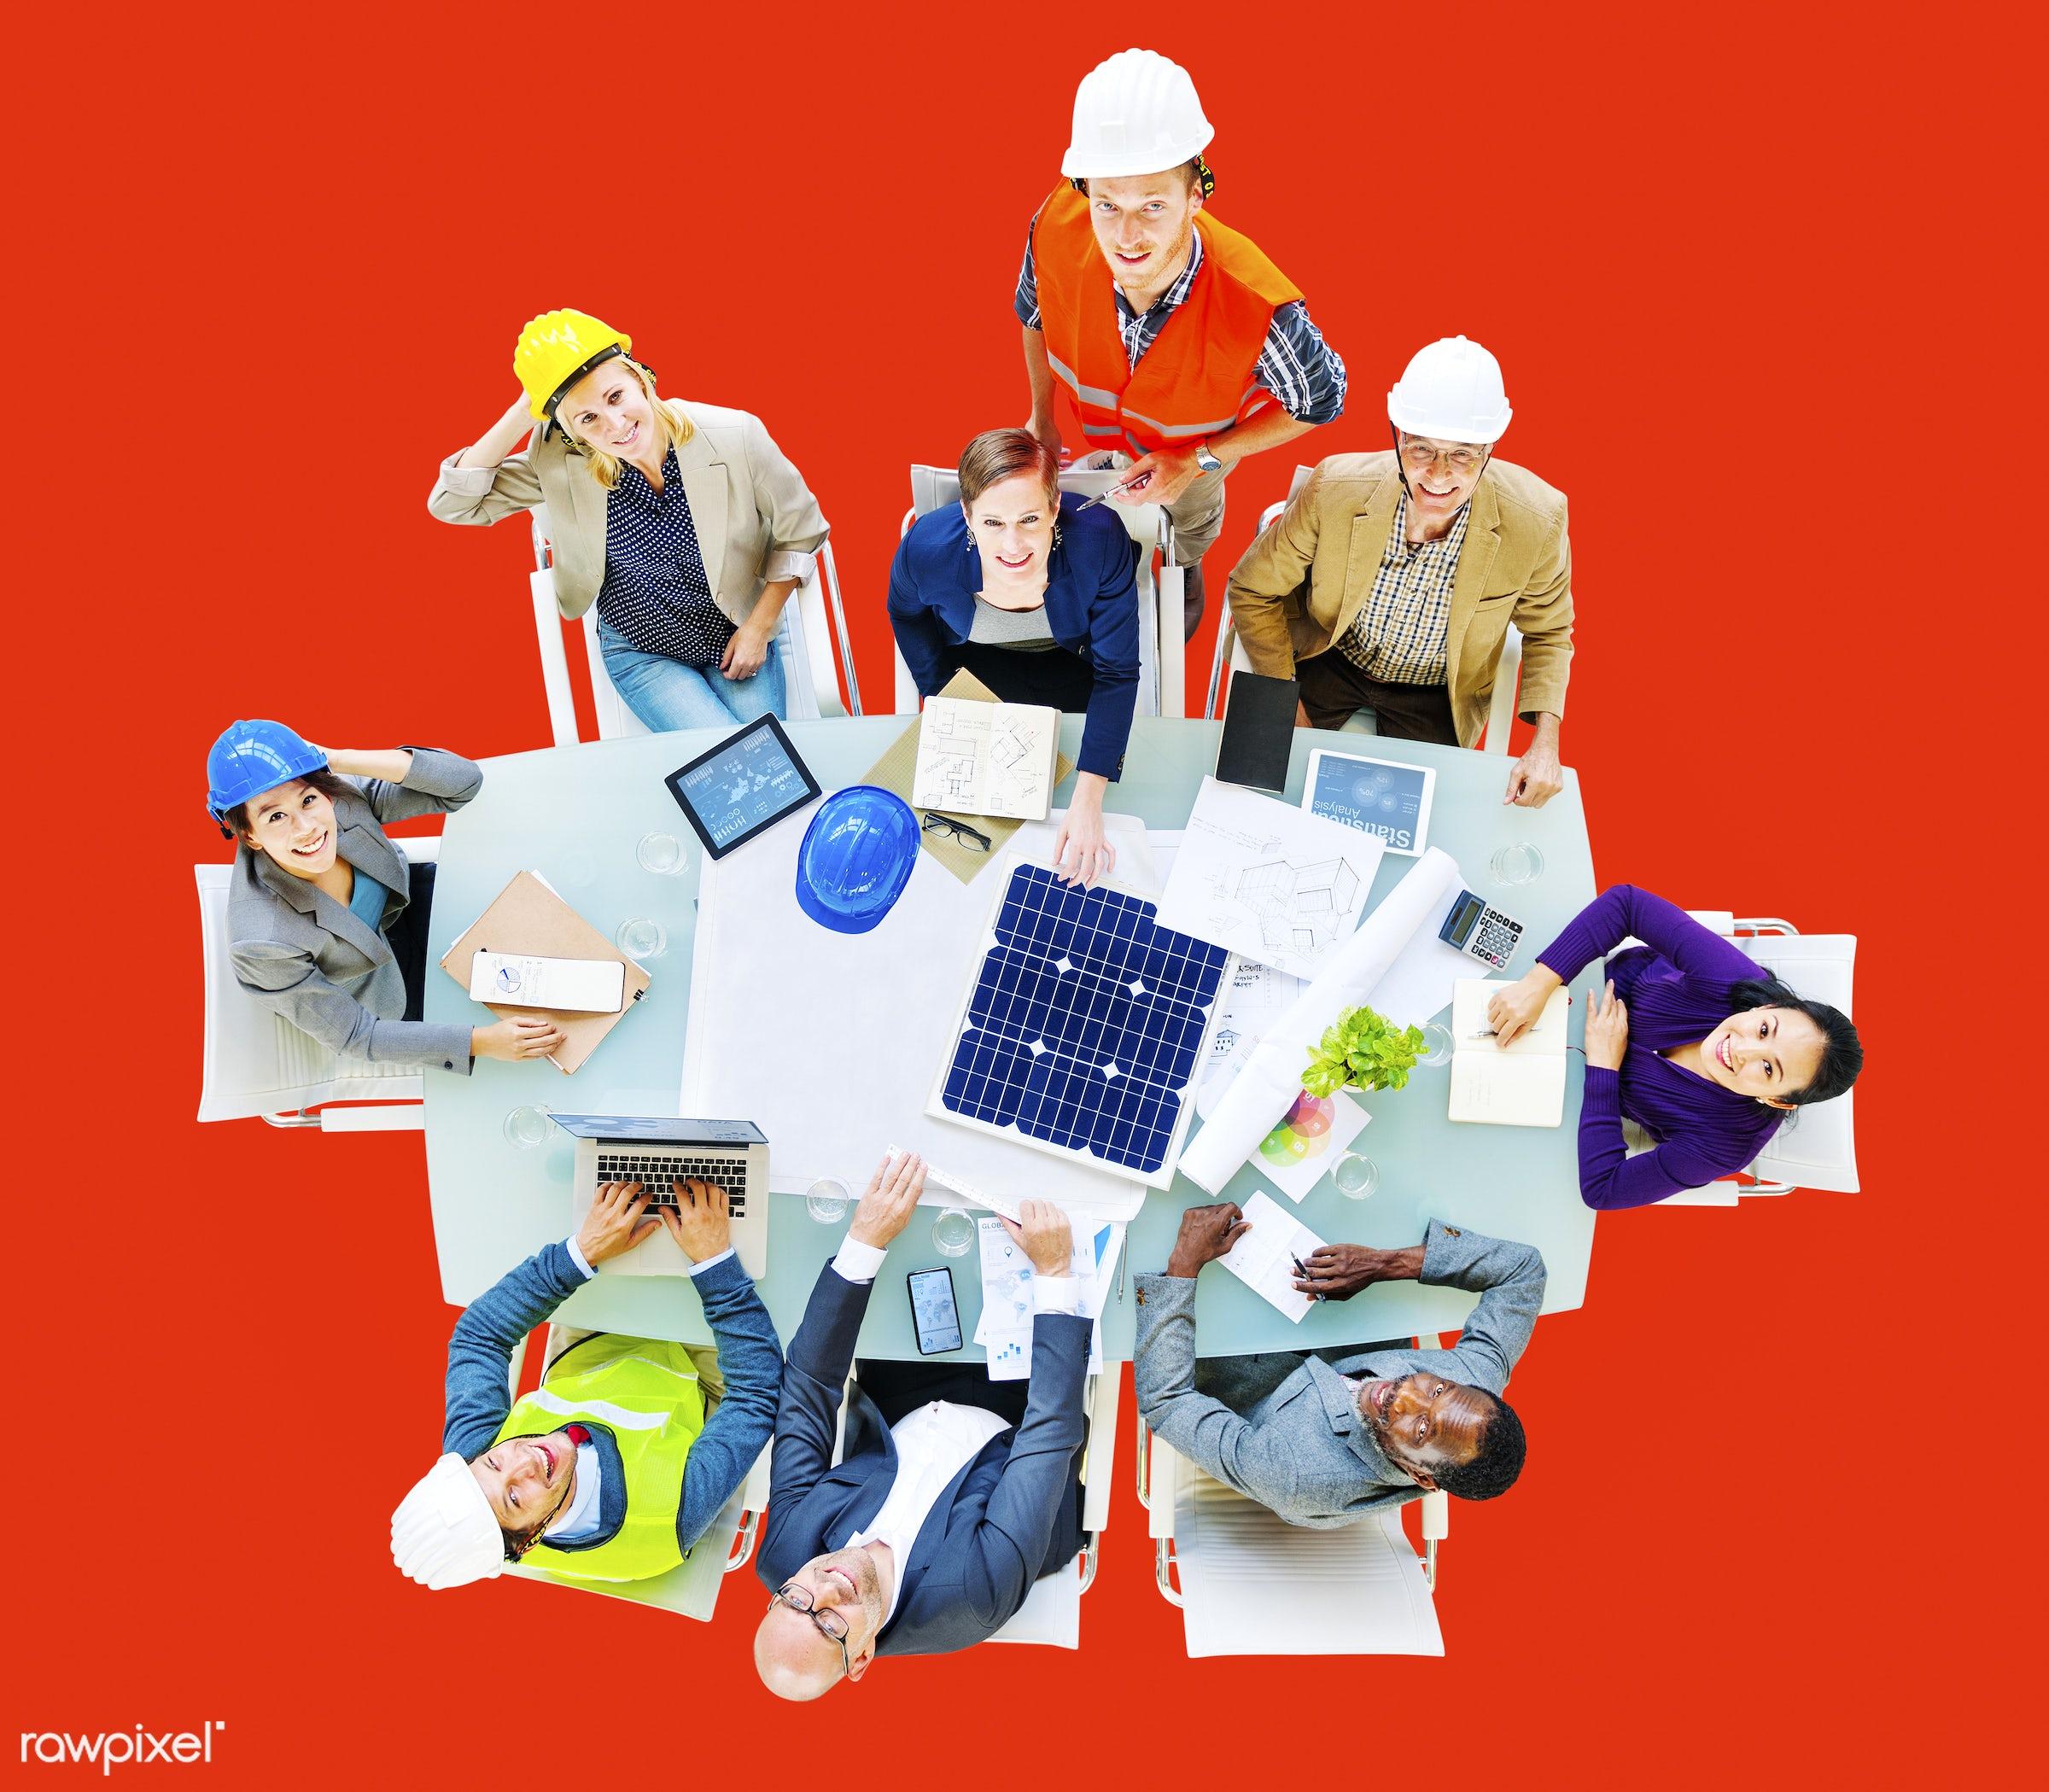 african descent, architect, architecture, asian ethnicity, blueprint, brainstorming, business, business people, businessmen...